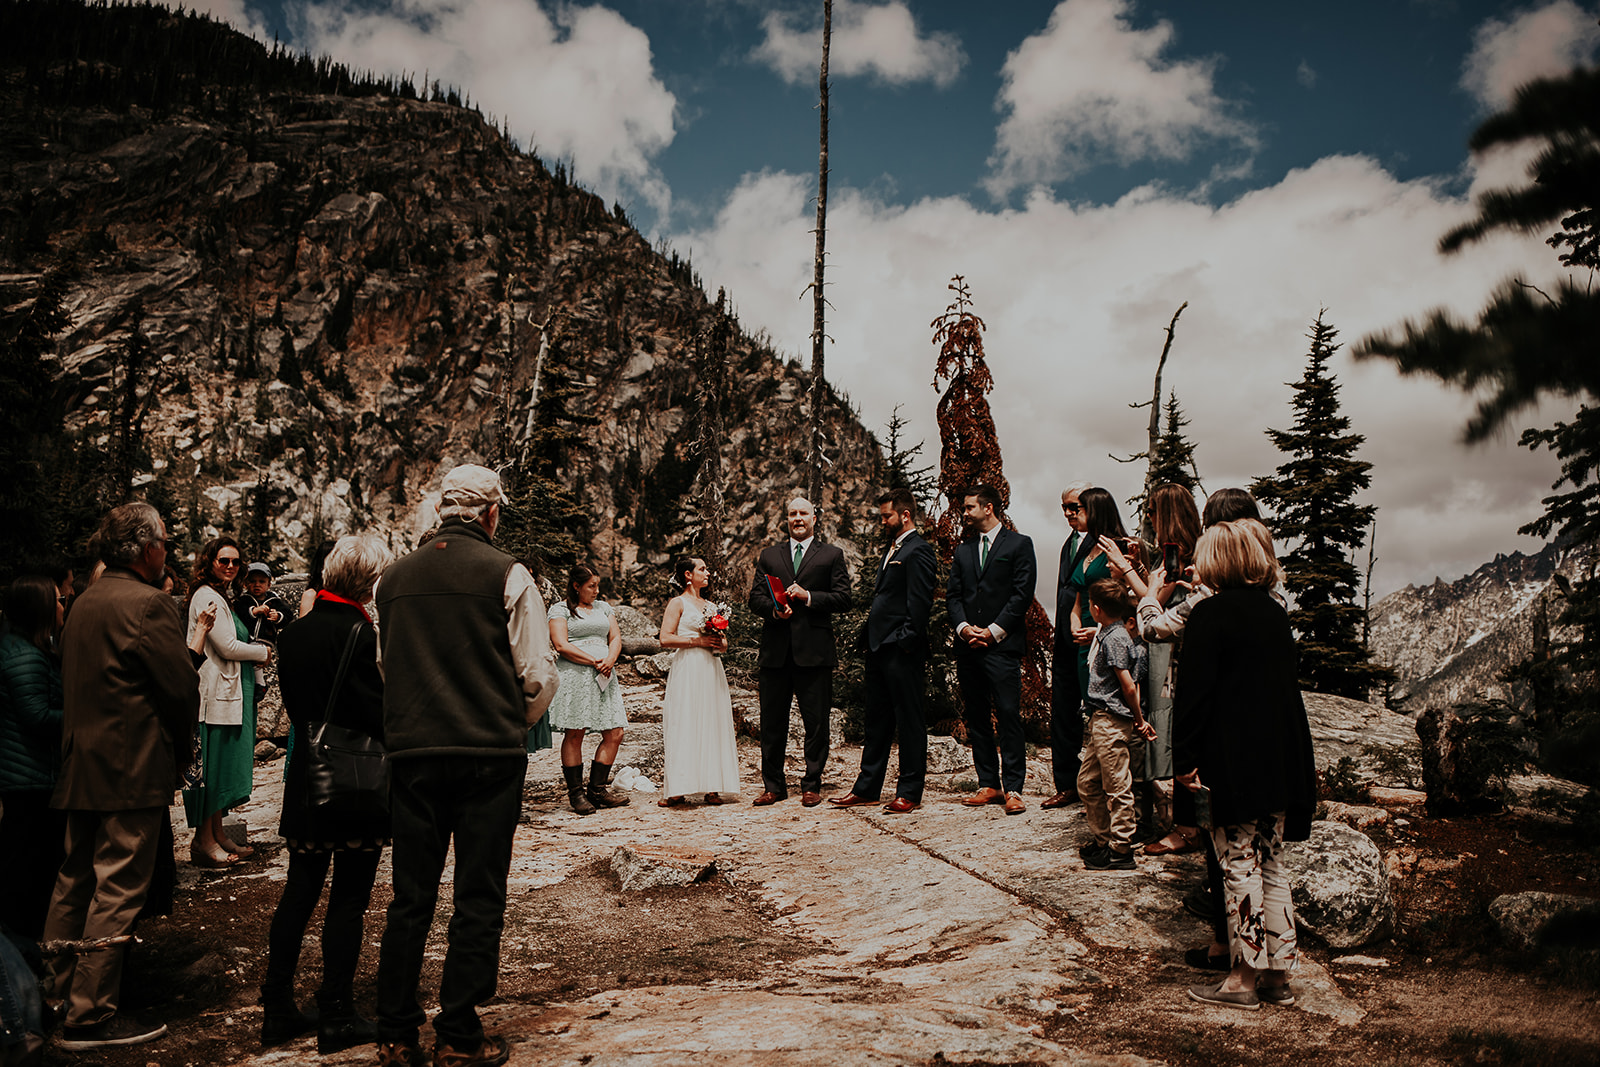 winthrop-wedding-photographer-megan-gallagher-photography (10).jpg